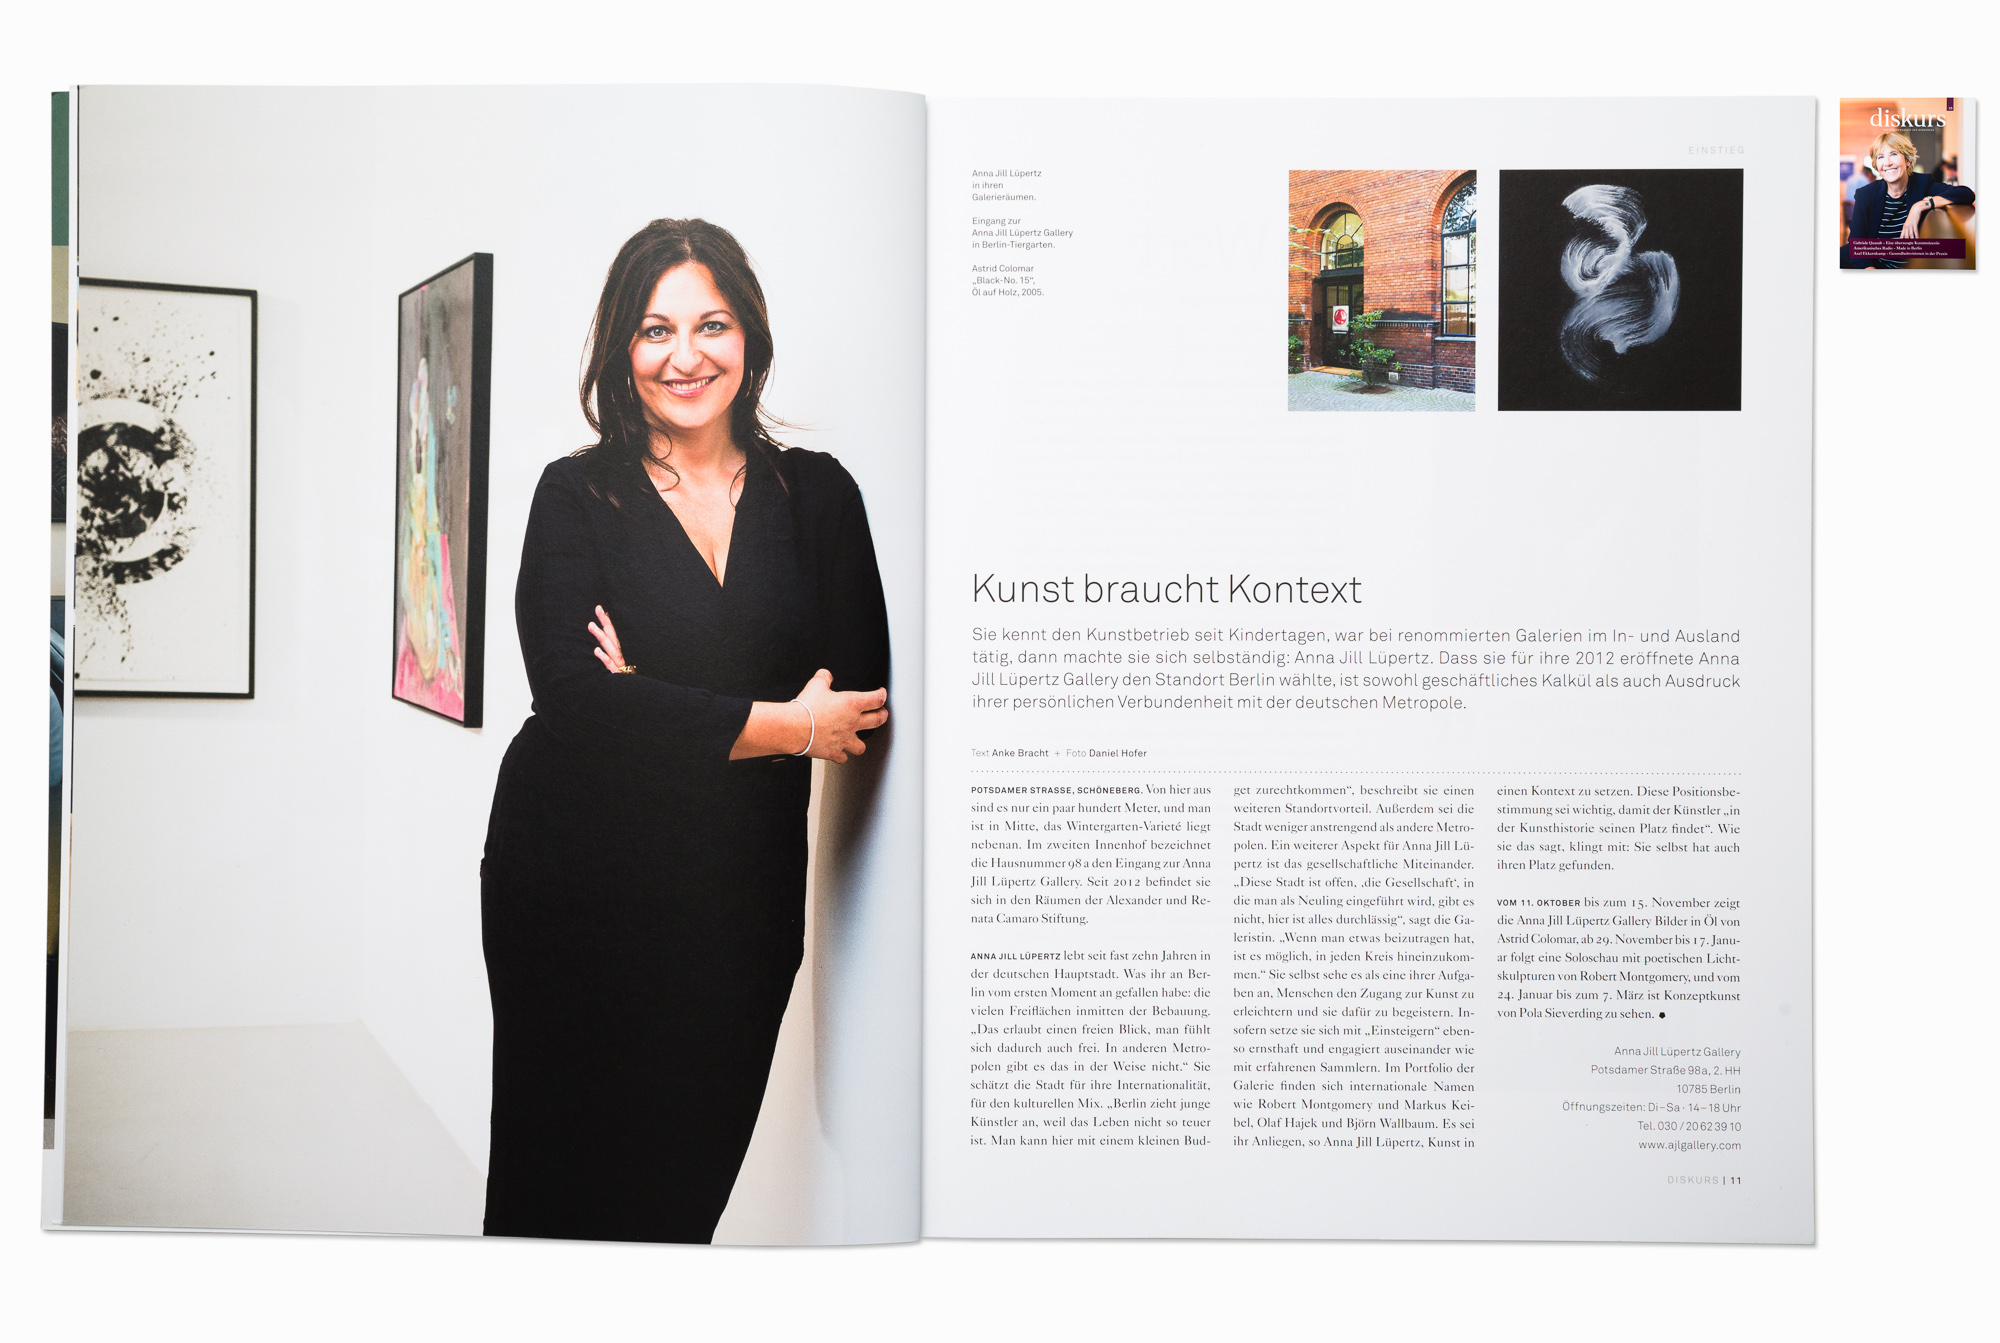 Gallery owner Anna Jill Luepertz for Diskurs magazine, Berlin 2014